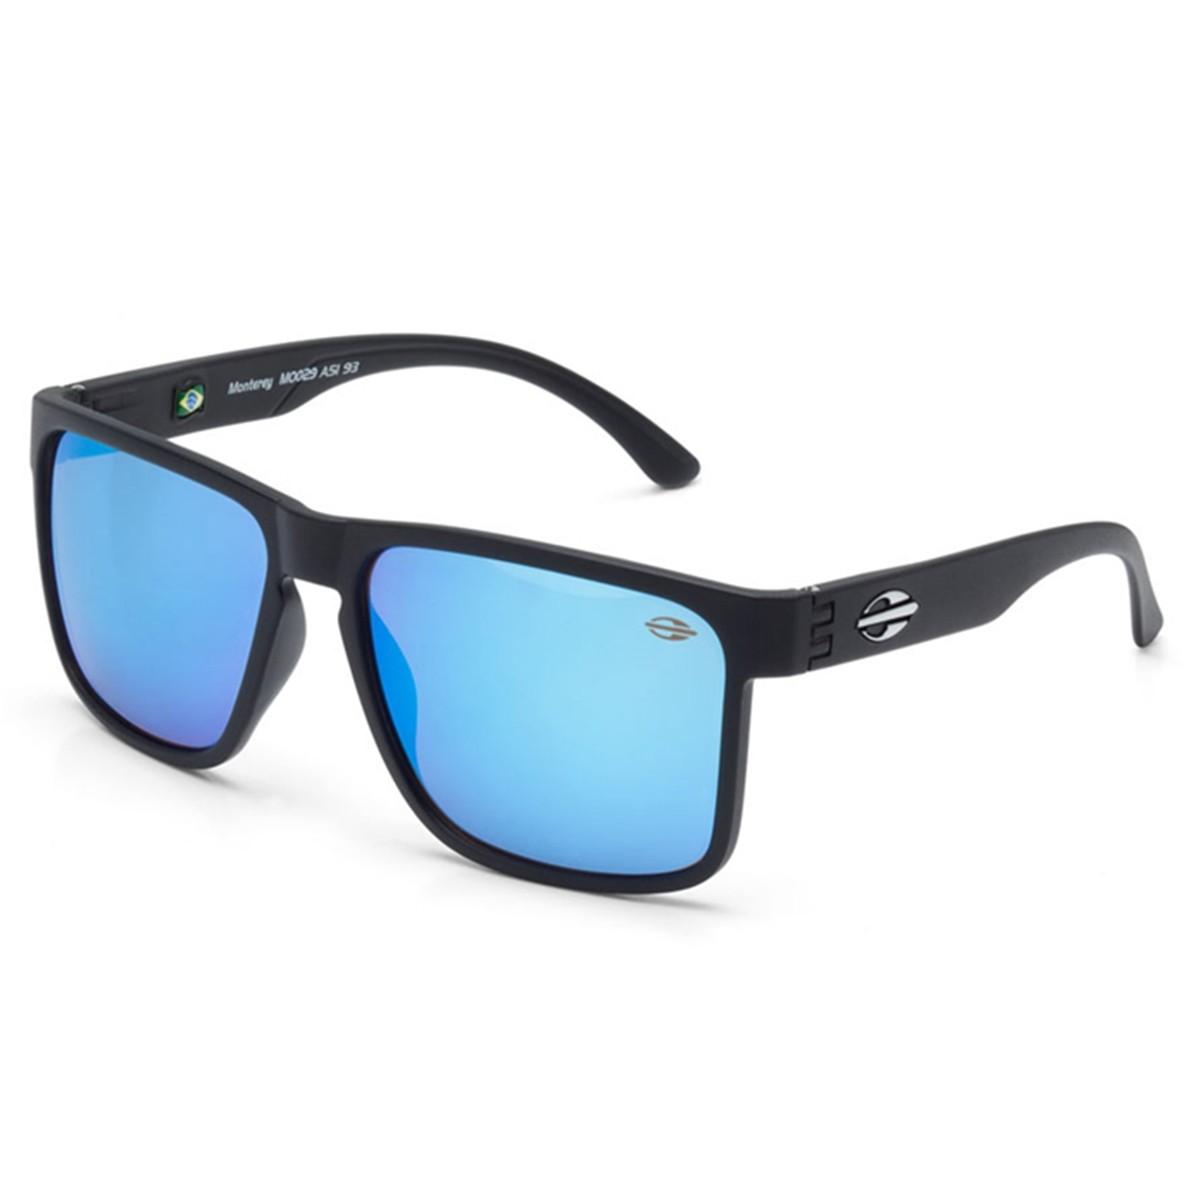 669663c6d Compre Óculos de Sol Mormaii Monterey em 10X | Tri-Jóia Shop